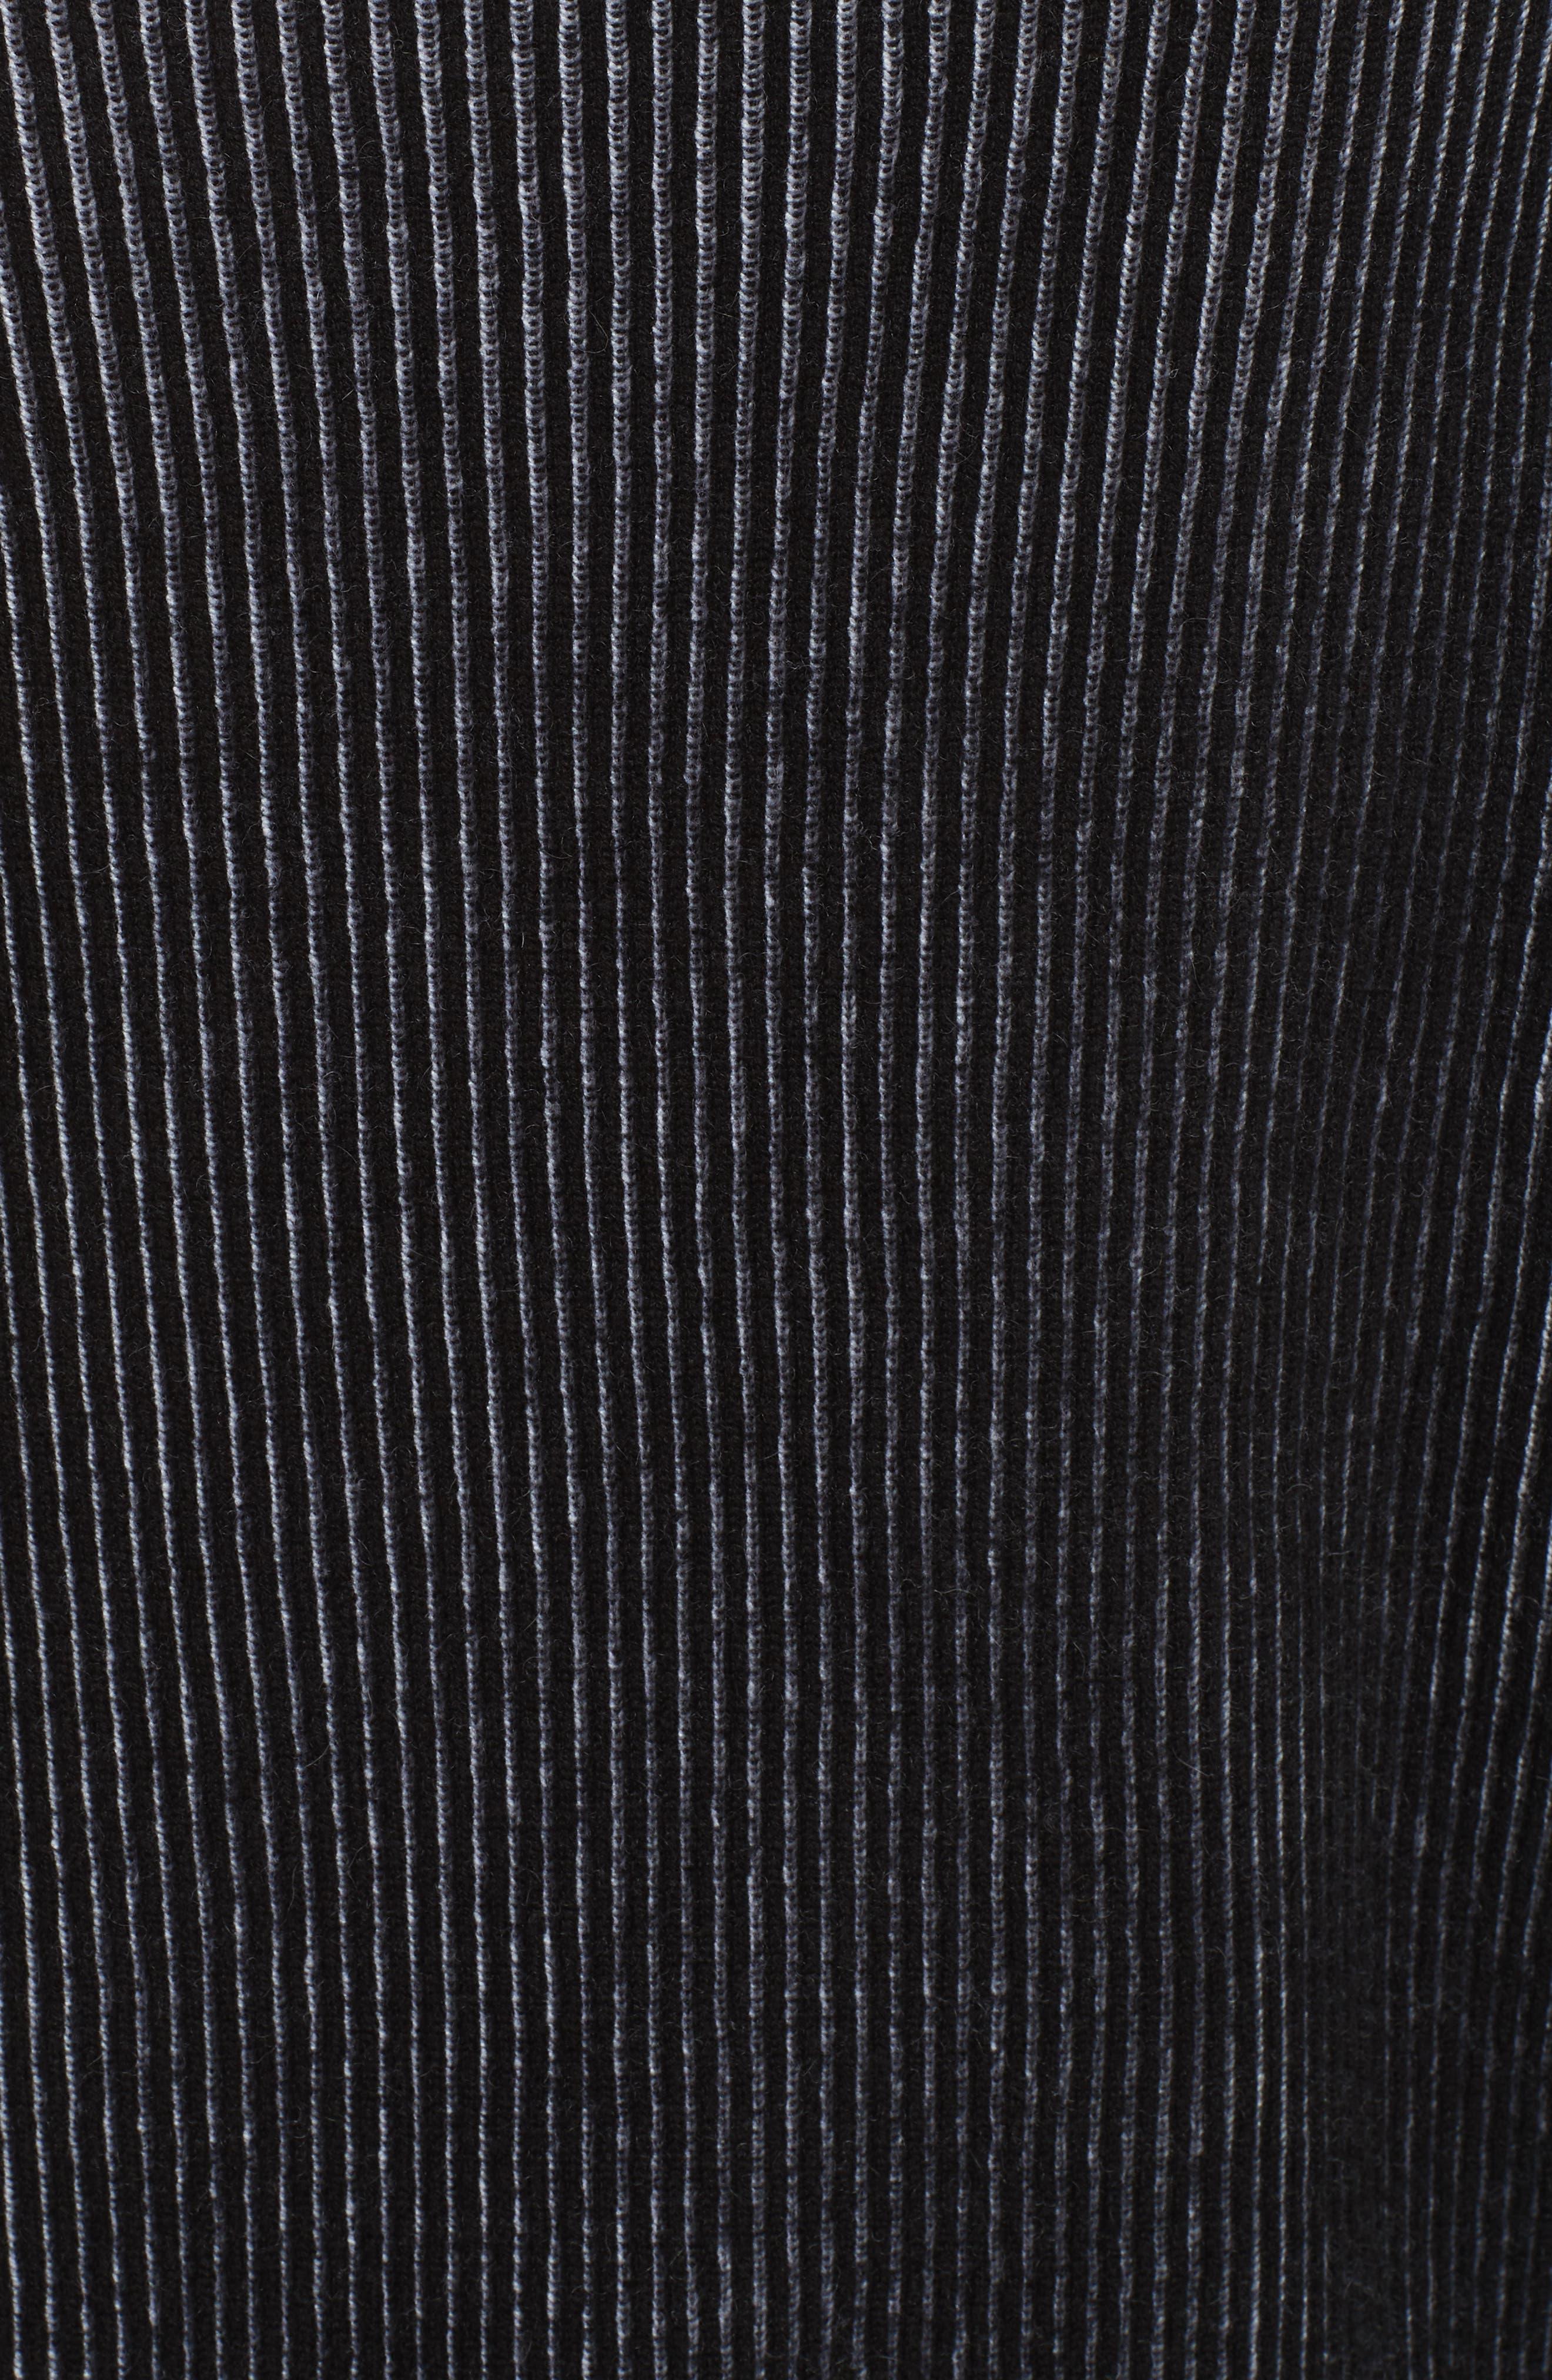 AAA Turtleneck Cashmere Sweater,                             Alternate thumbnail 5, color,                             BLACK/ CREAM